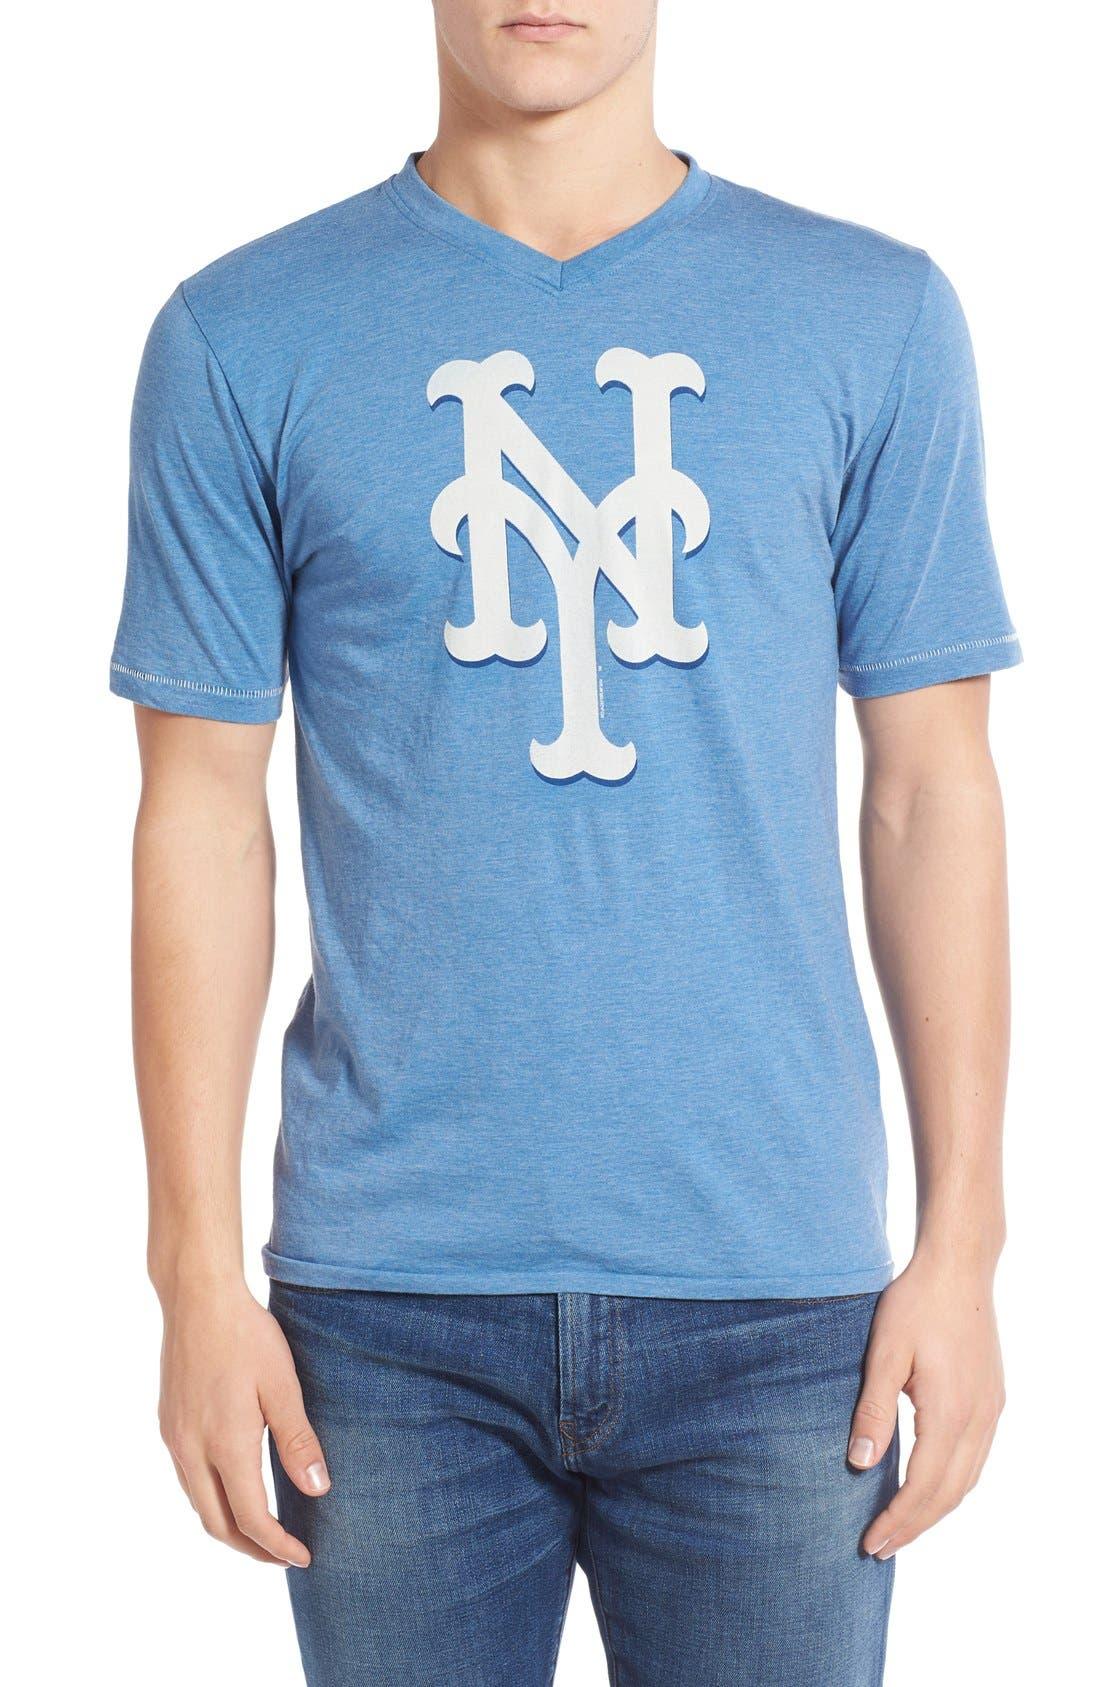 Red Jacket 'New York Mets - Calumet' Graphic V-Neck T-Shirt